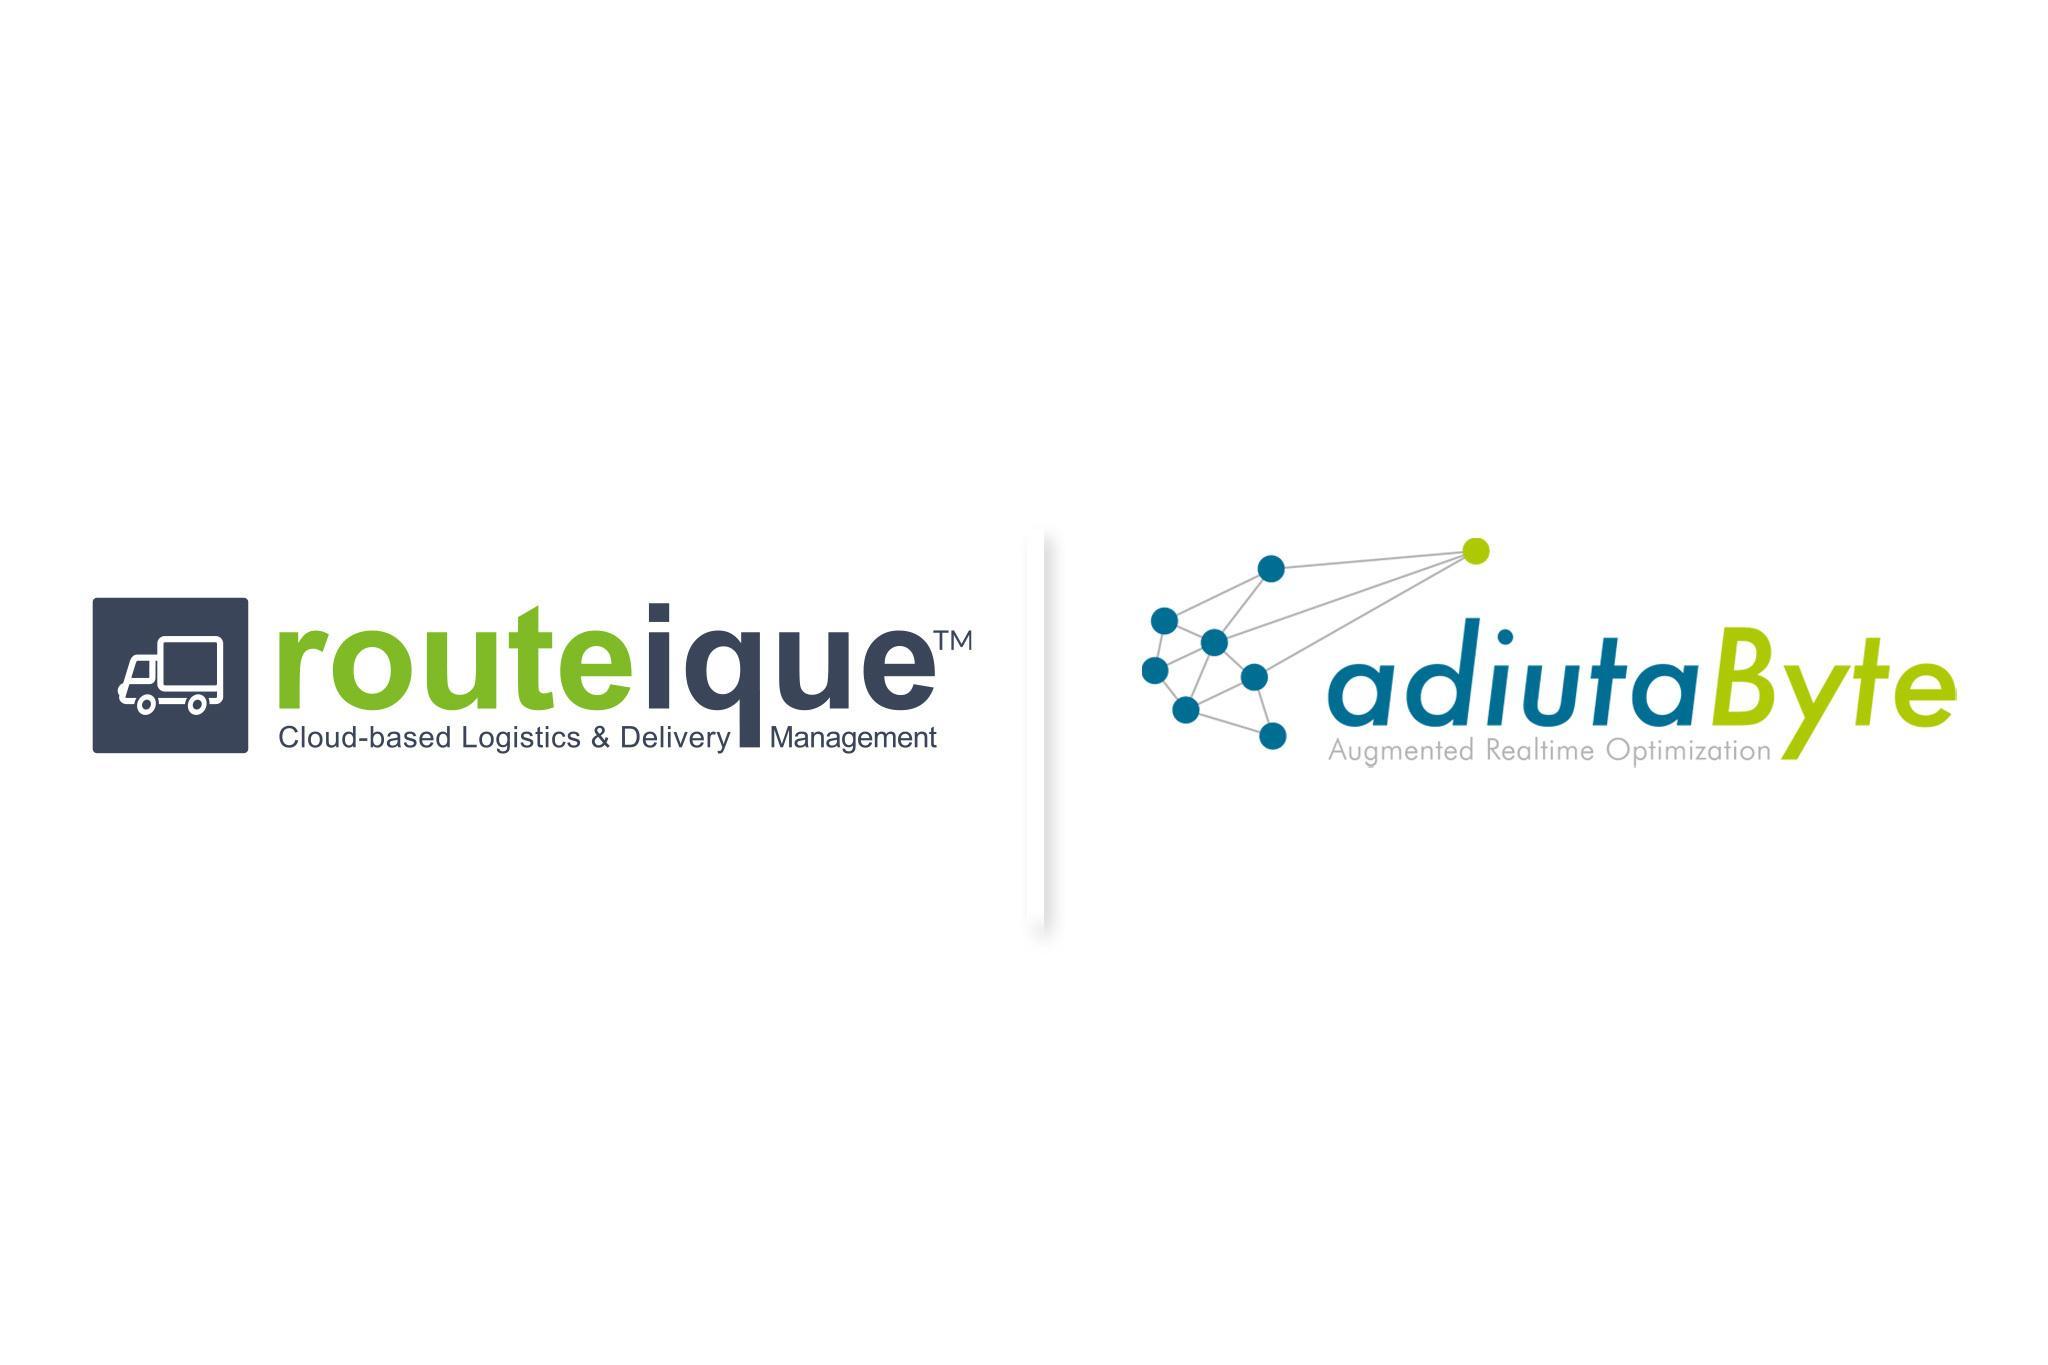 Routeique and adiutaByte